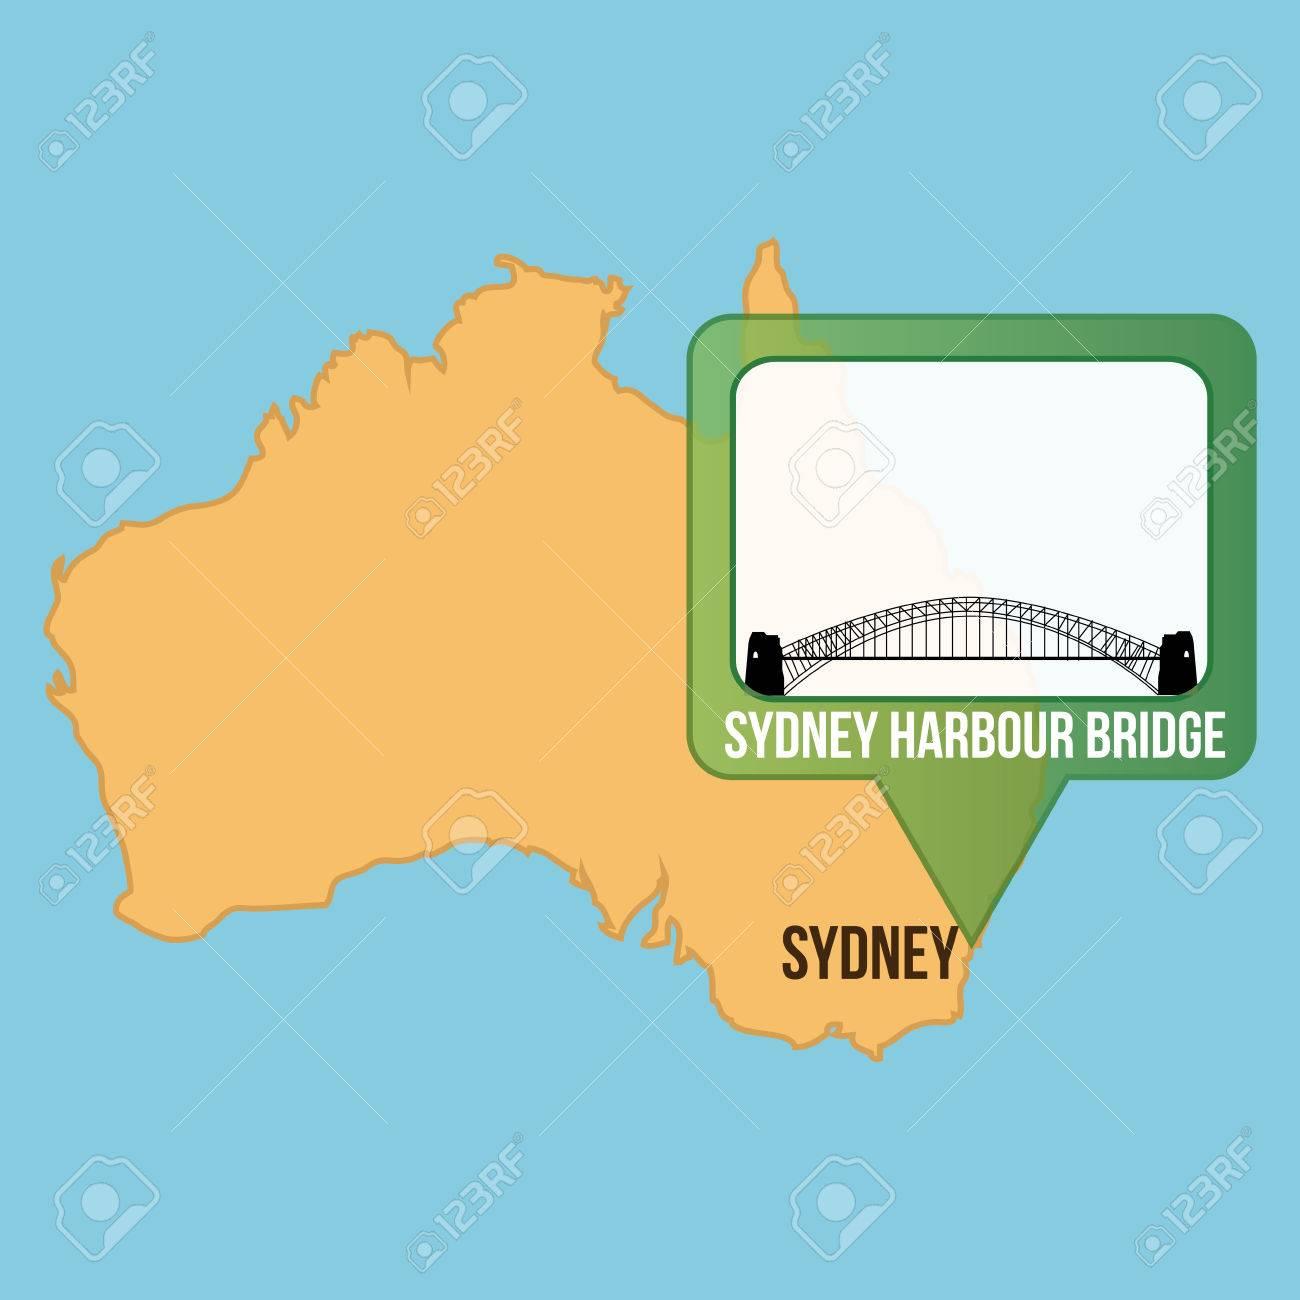 Sydney On Australia Map.Isolated Map Of Australia With The Sydney Harbour Bridge Vector